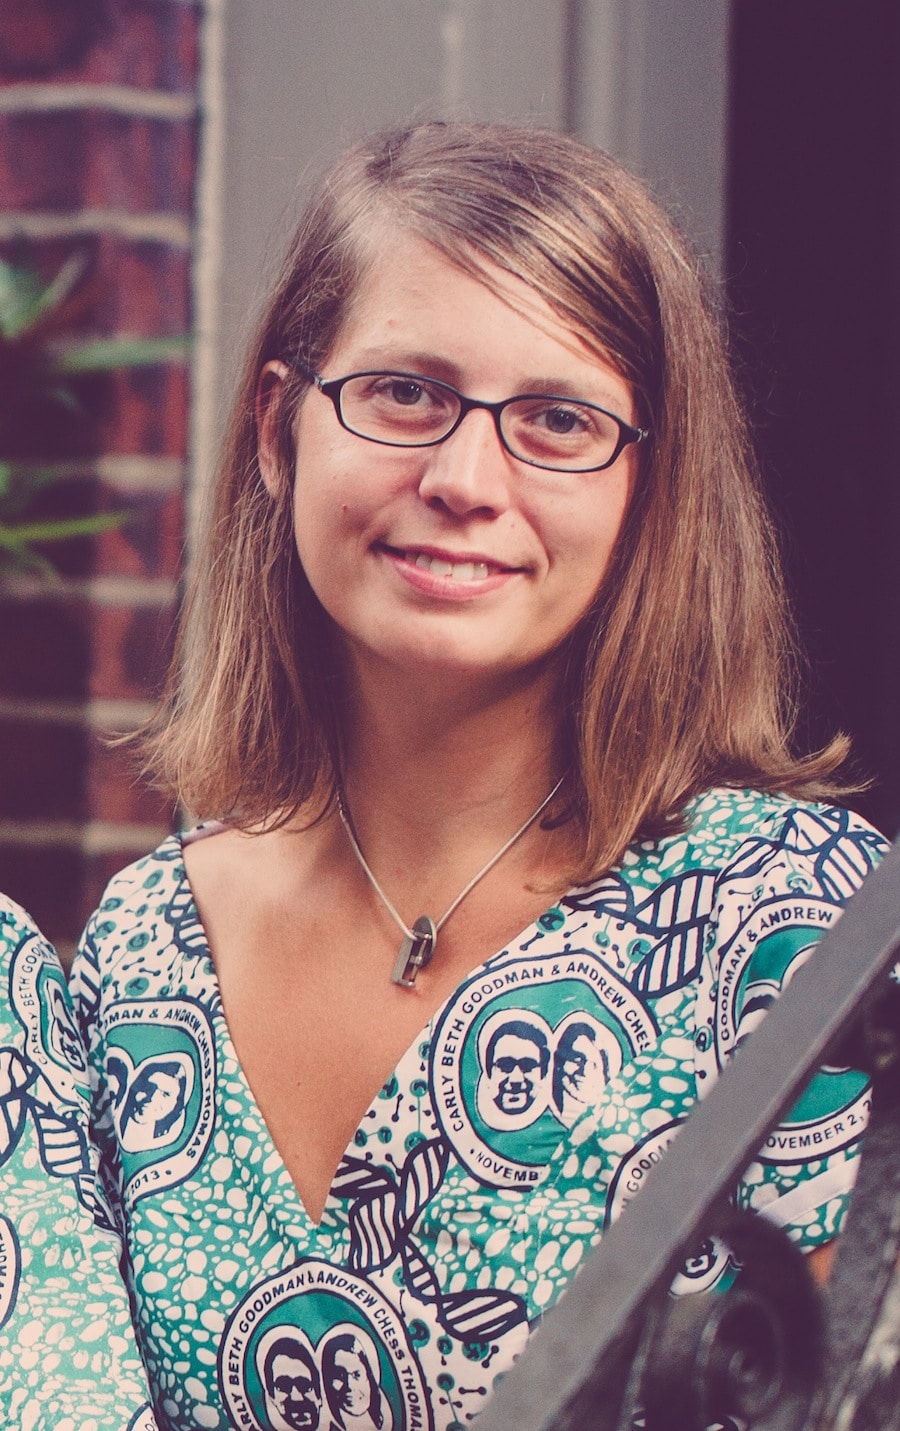 Carly from Philadelphia